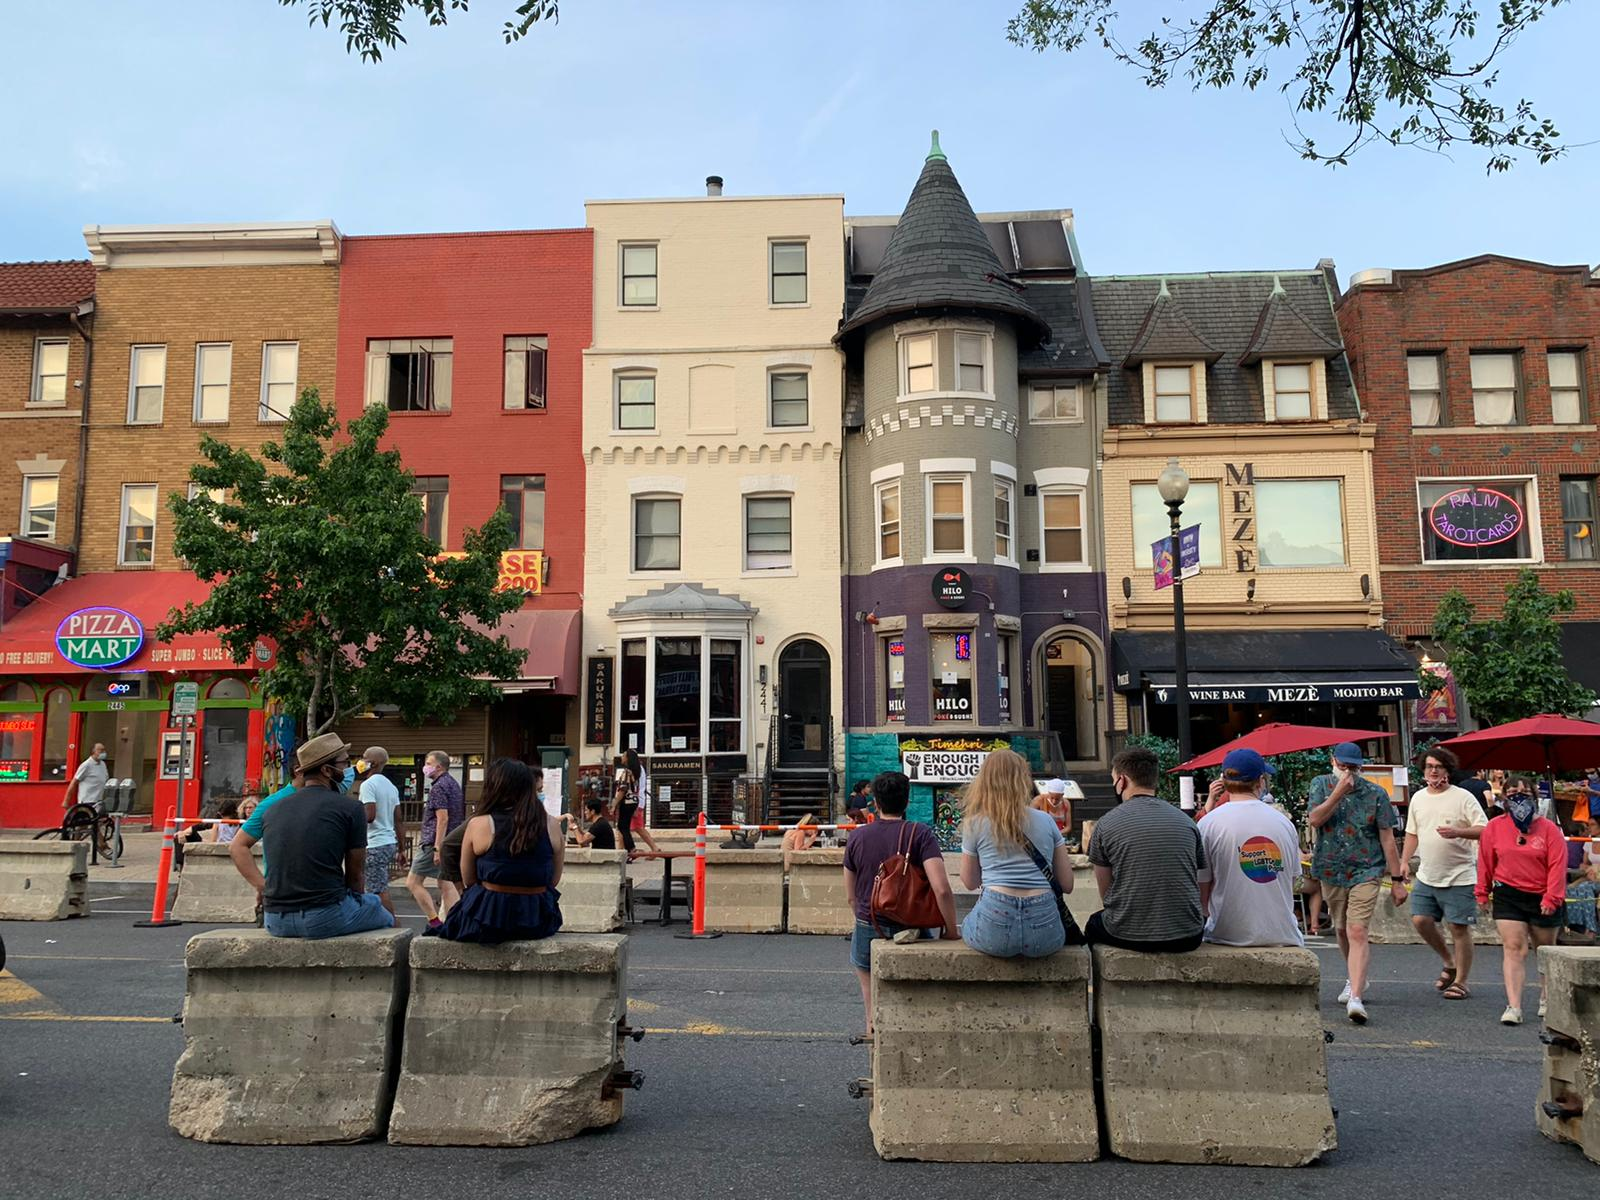 People sitting on concrete barriers alongside outdoor restaurant